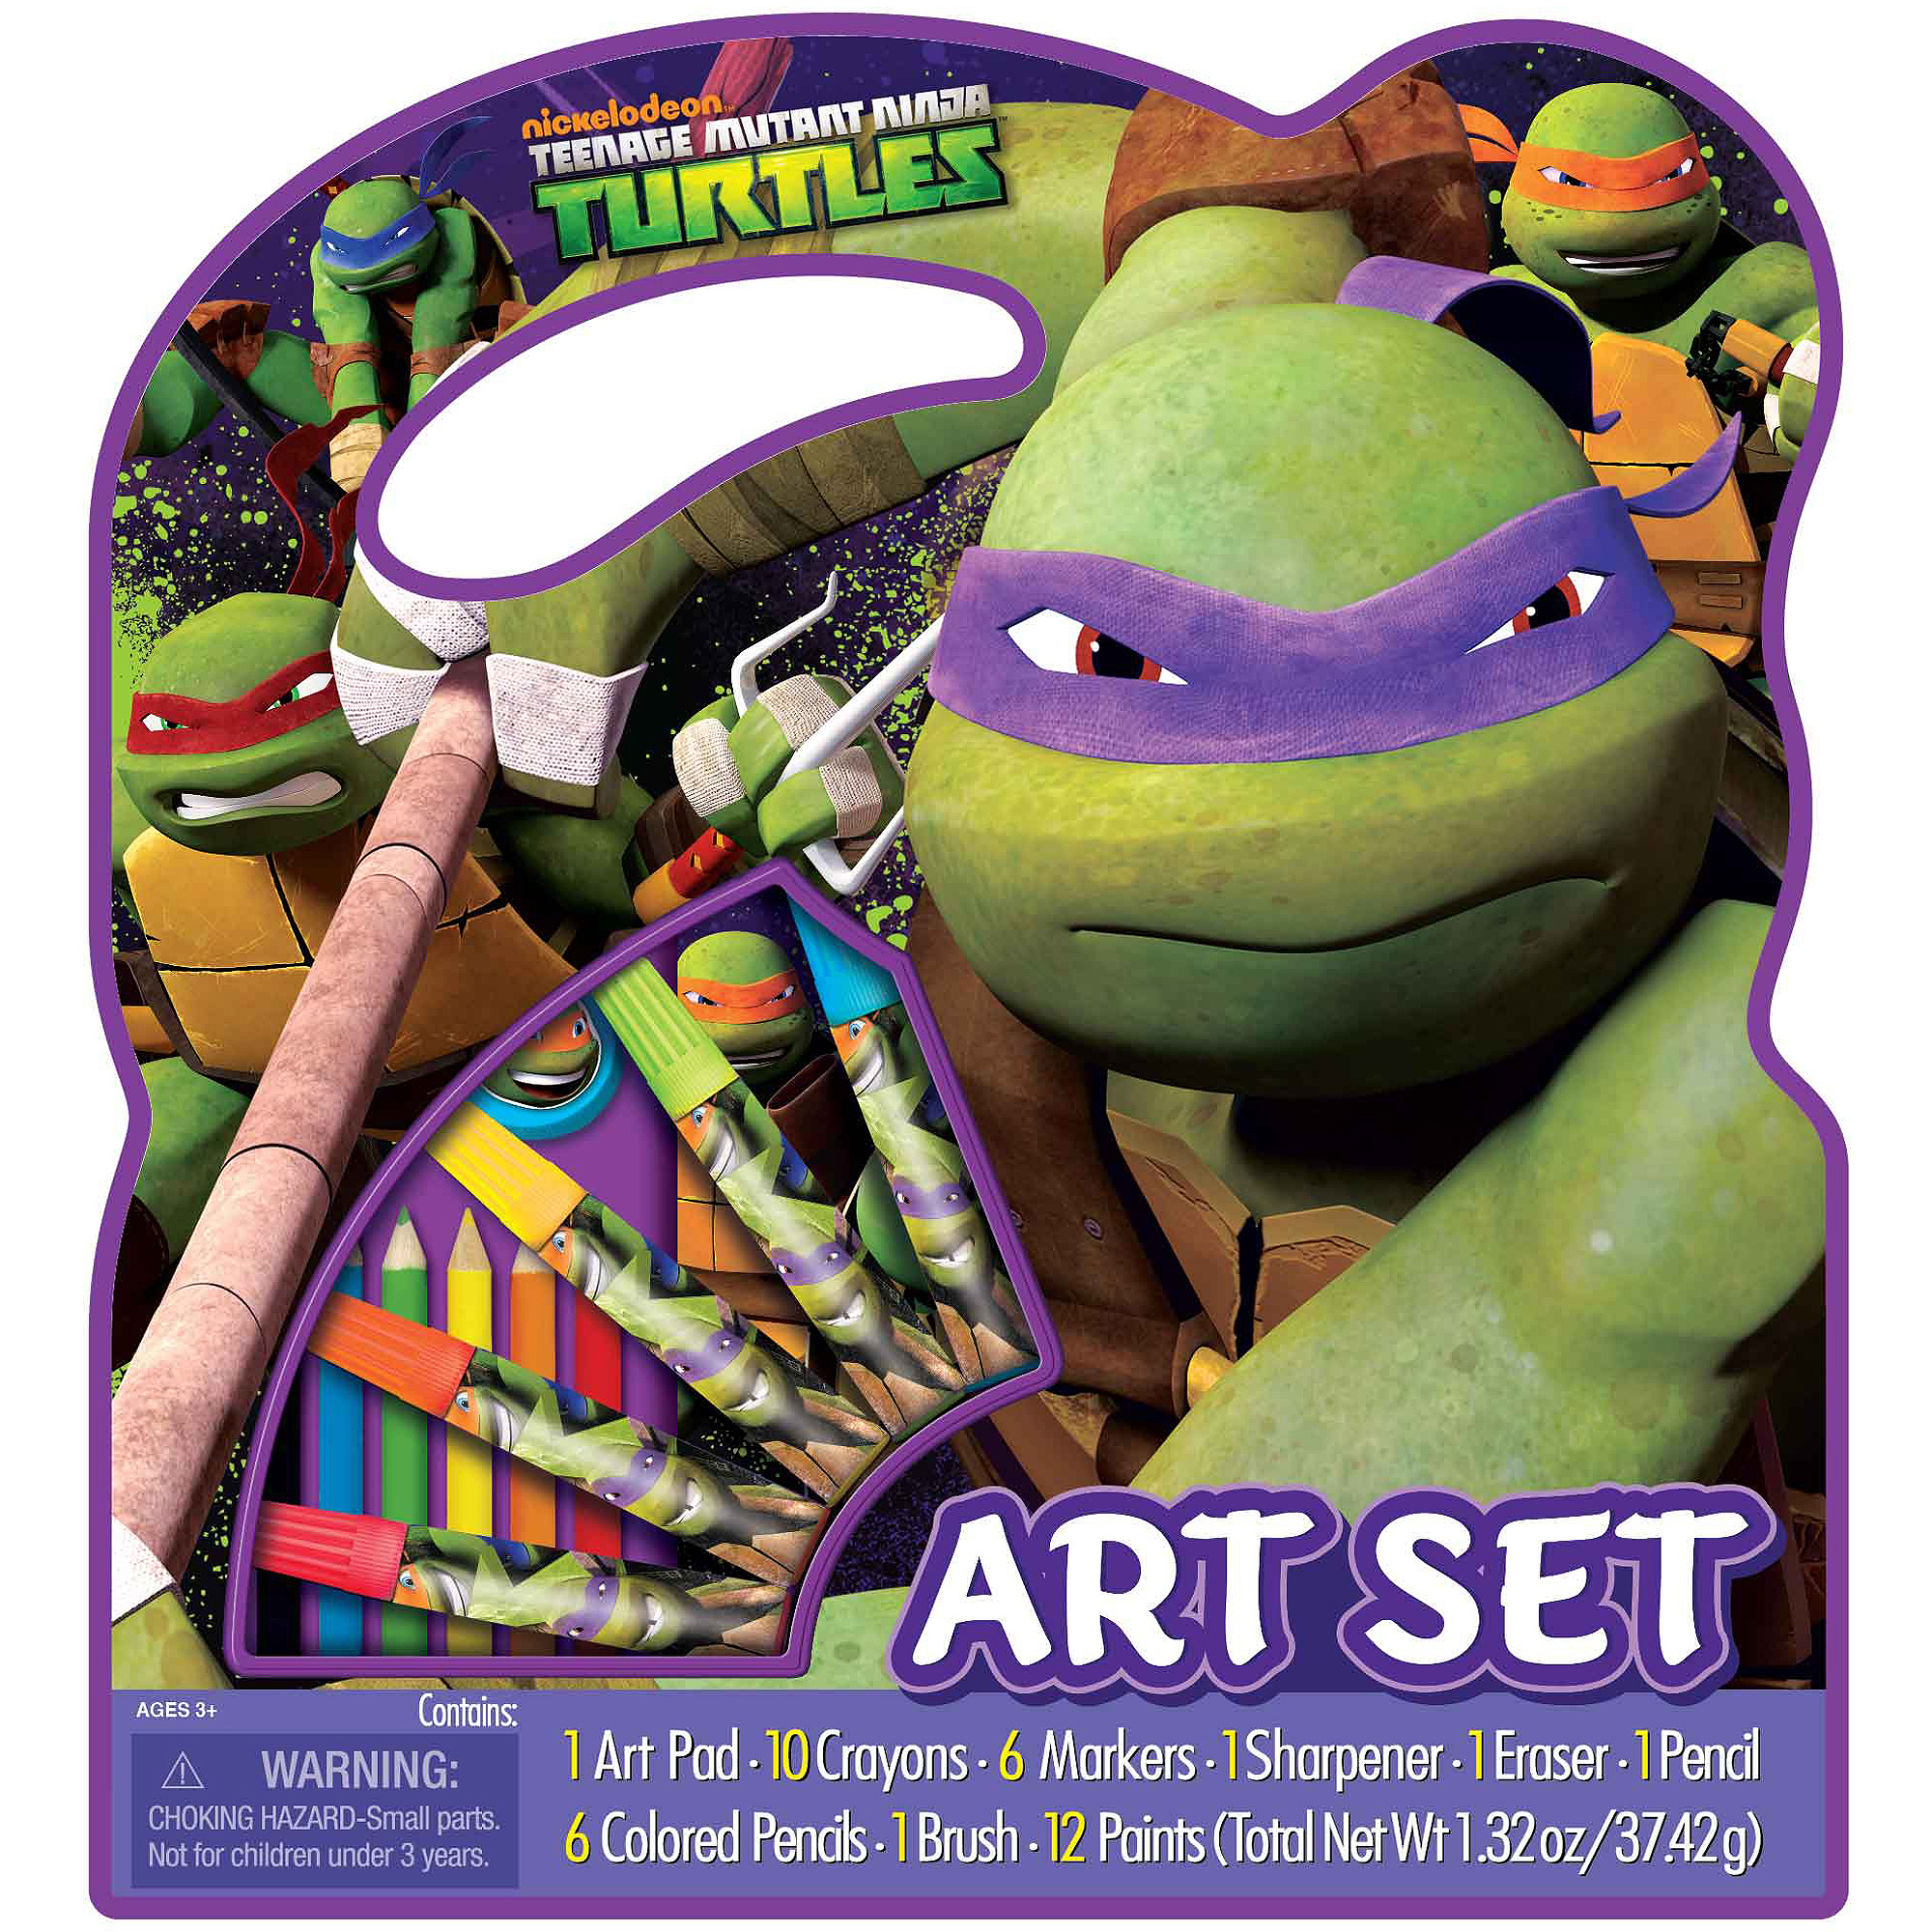 Nickelodeon Teenage Mutant Ninja Turtles Large Character Case